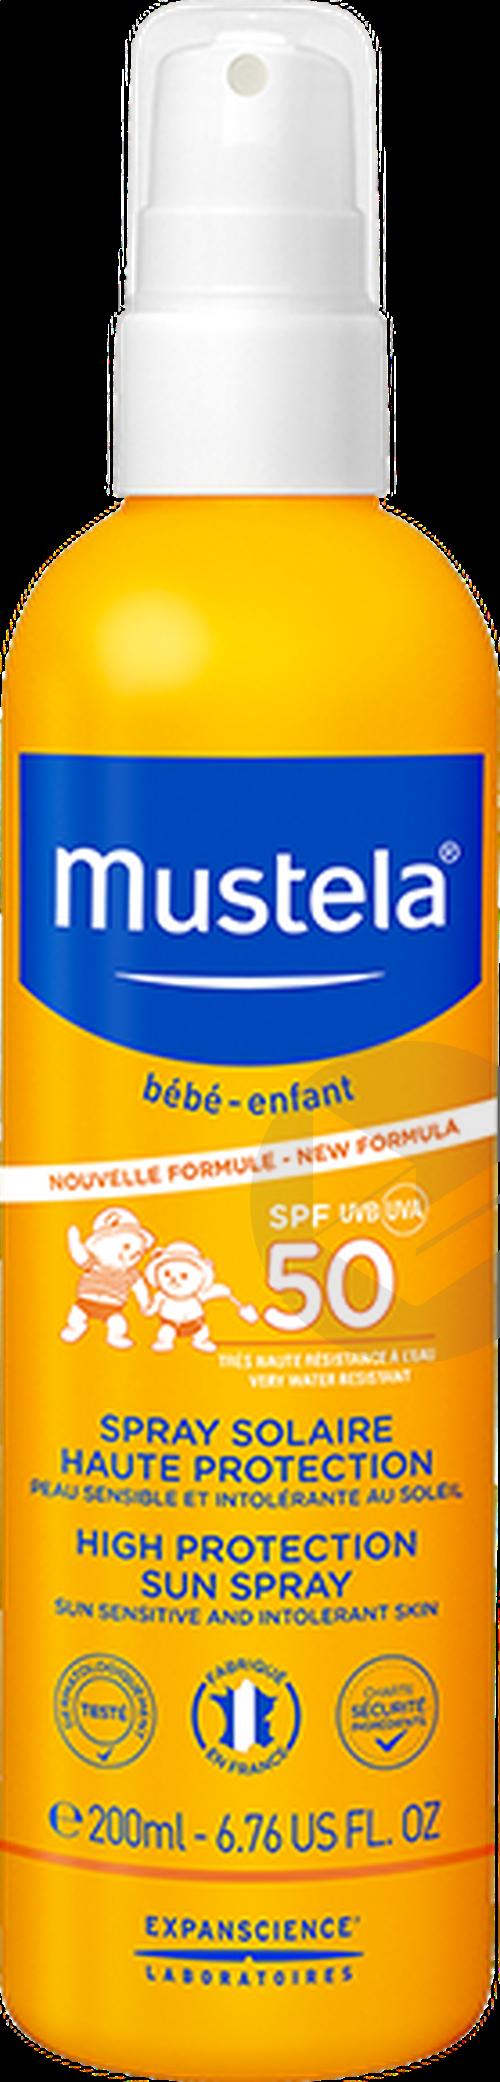 Spray Solaire Haute Protection Spf 50